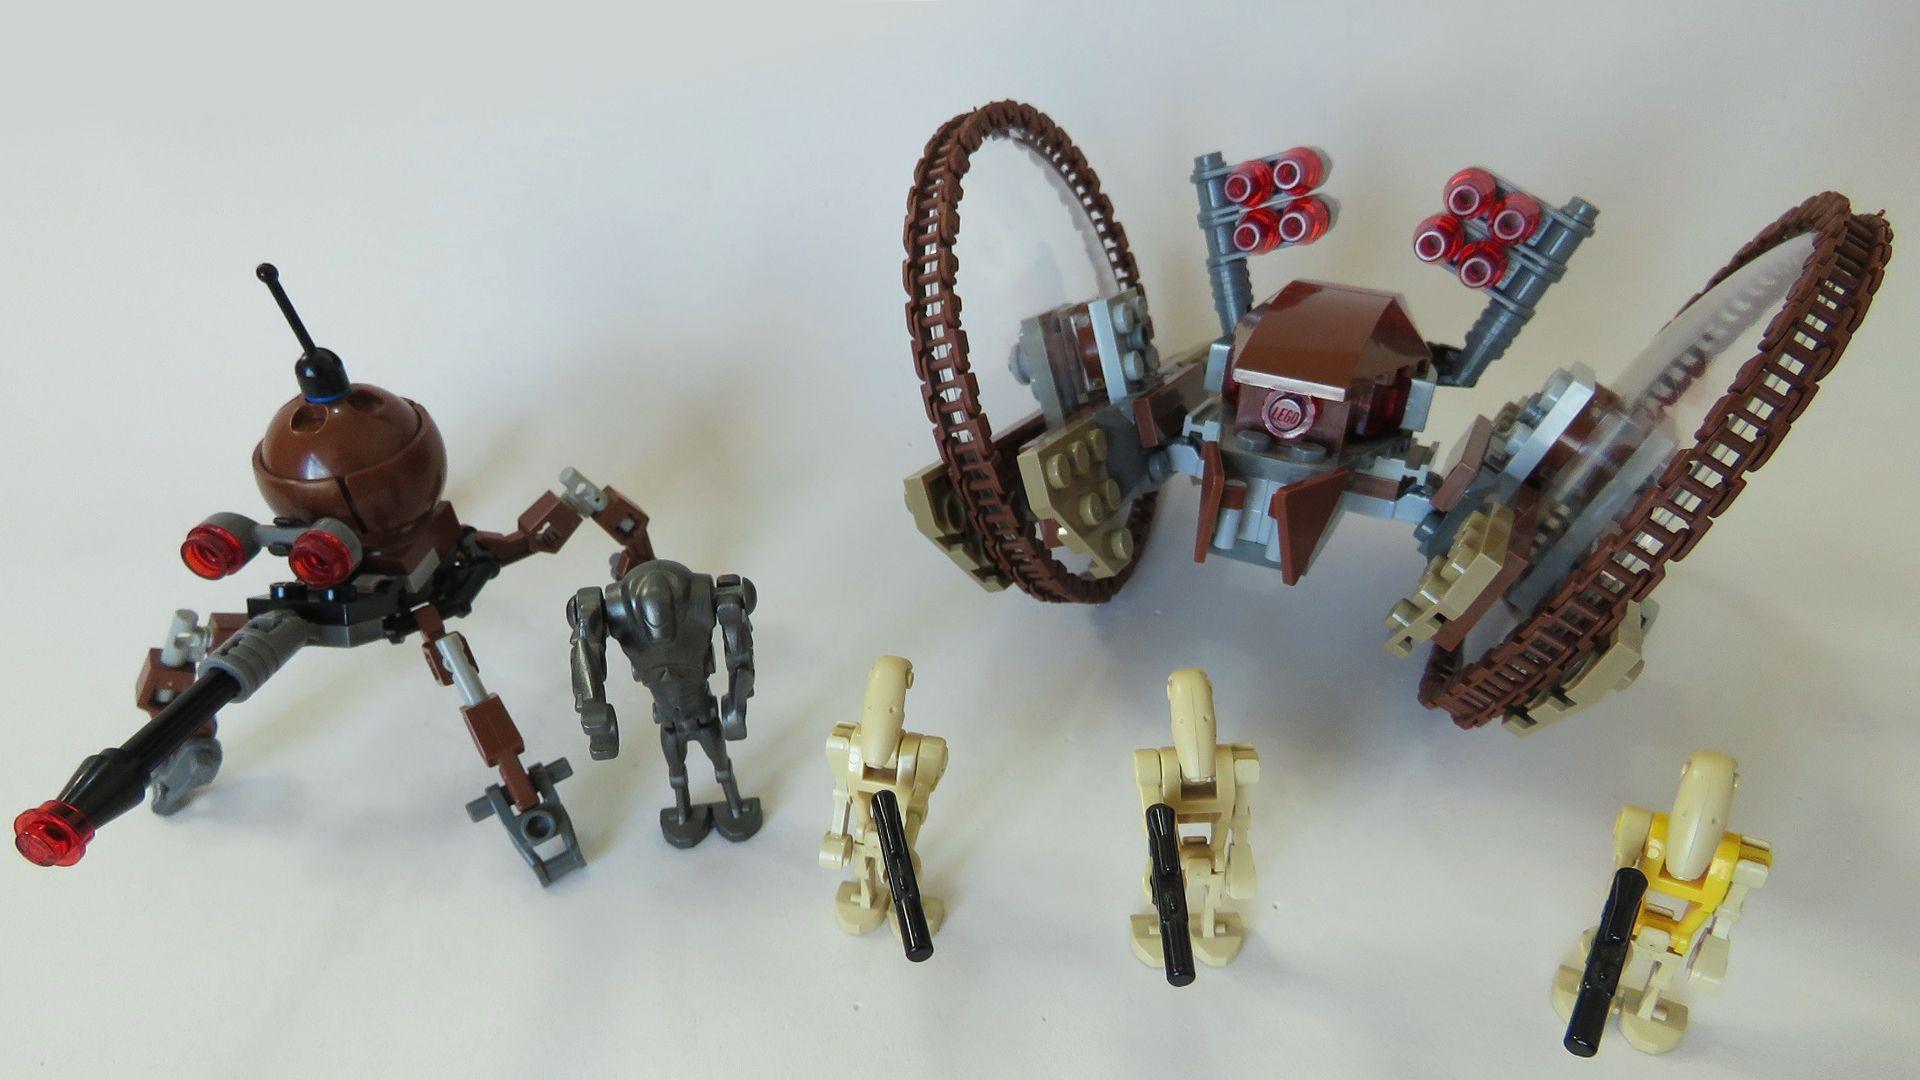 Lego Star Wars Hailfire Droid Spider Droid 7670 Build Intructions